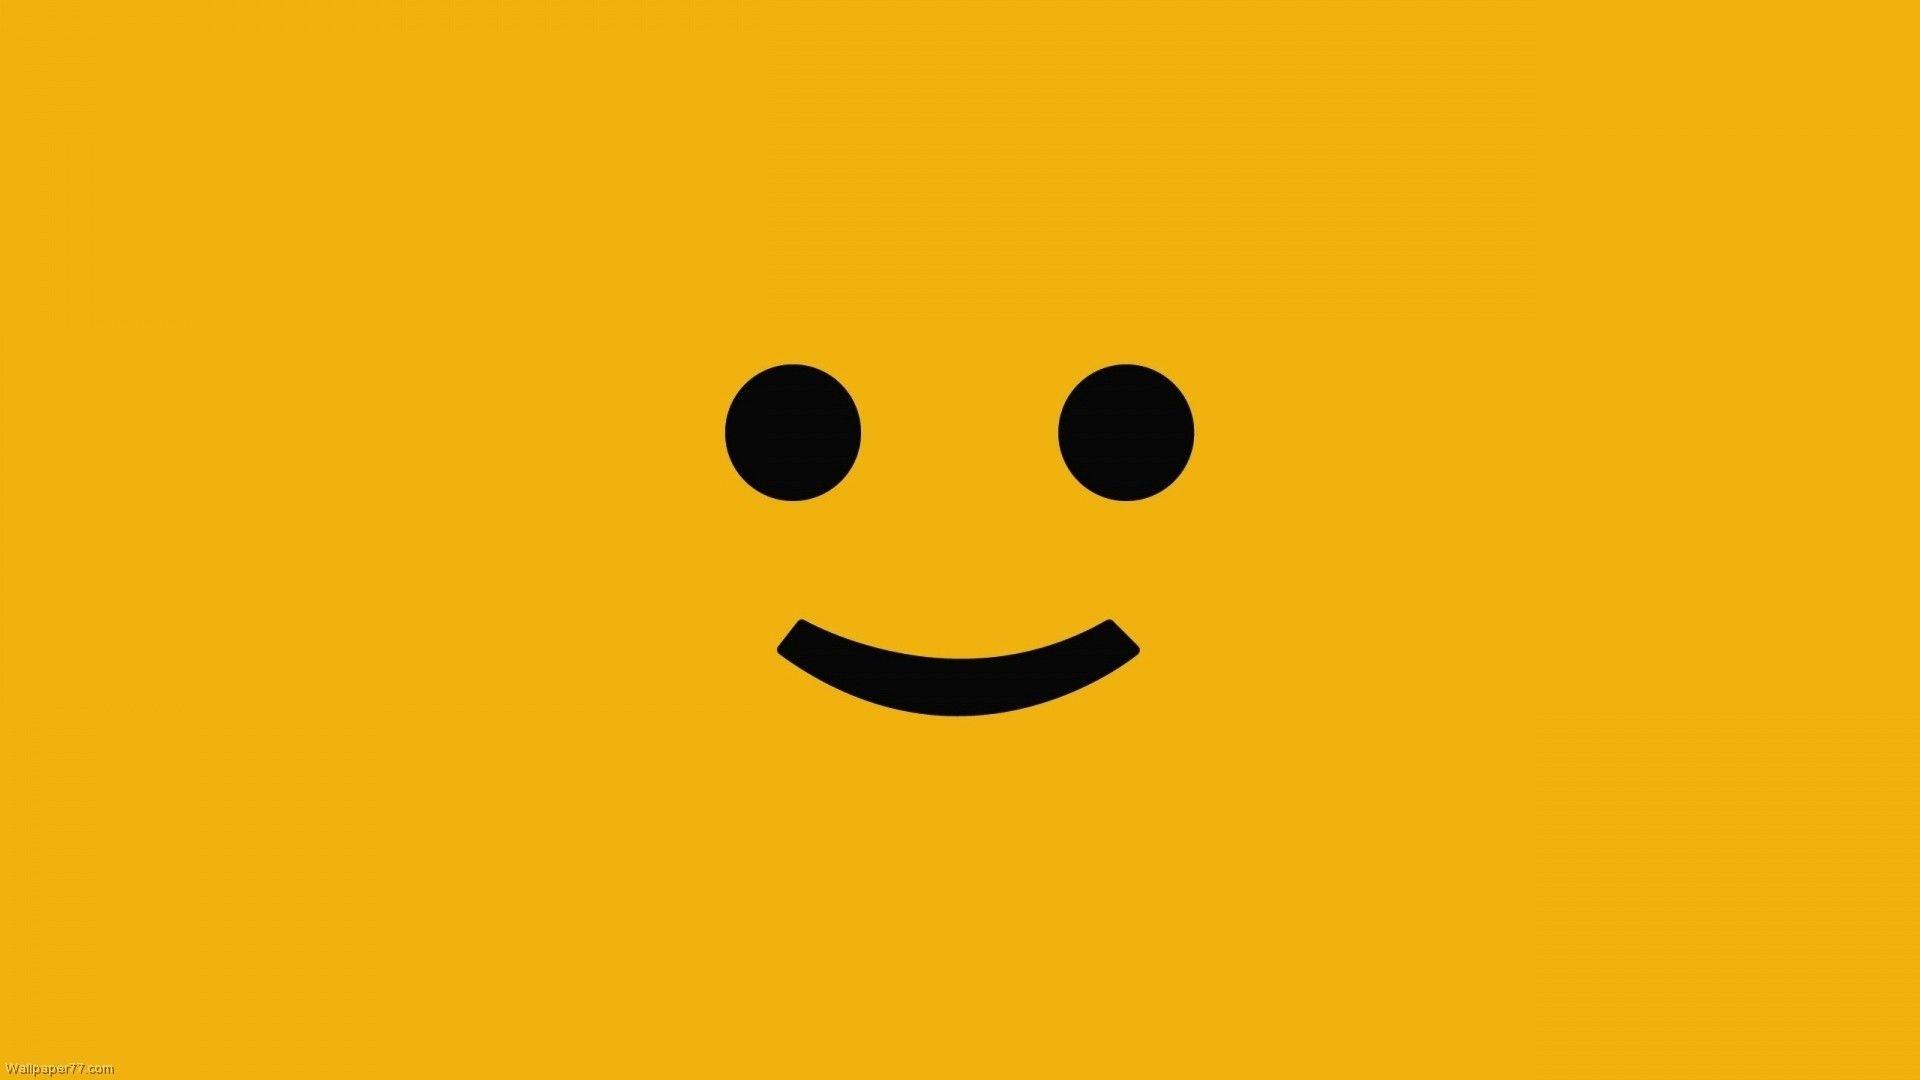 Cute Yellow hd desktop wallpaper